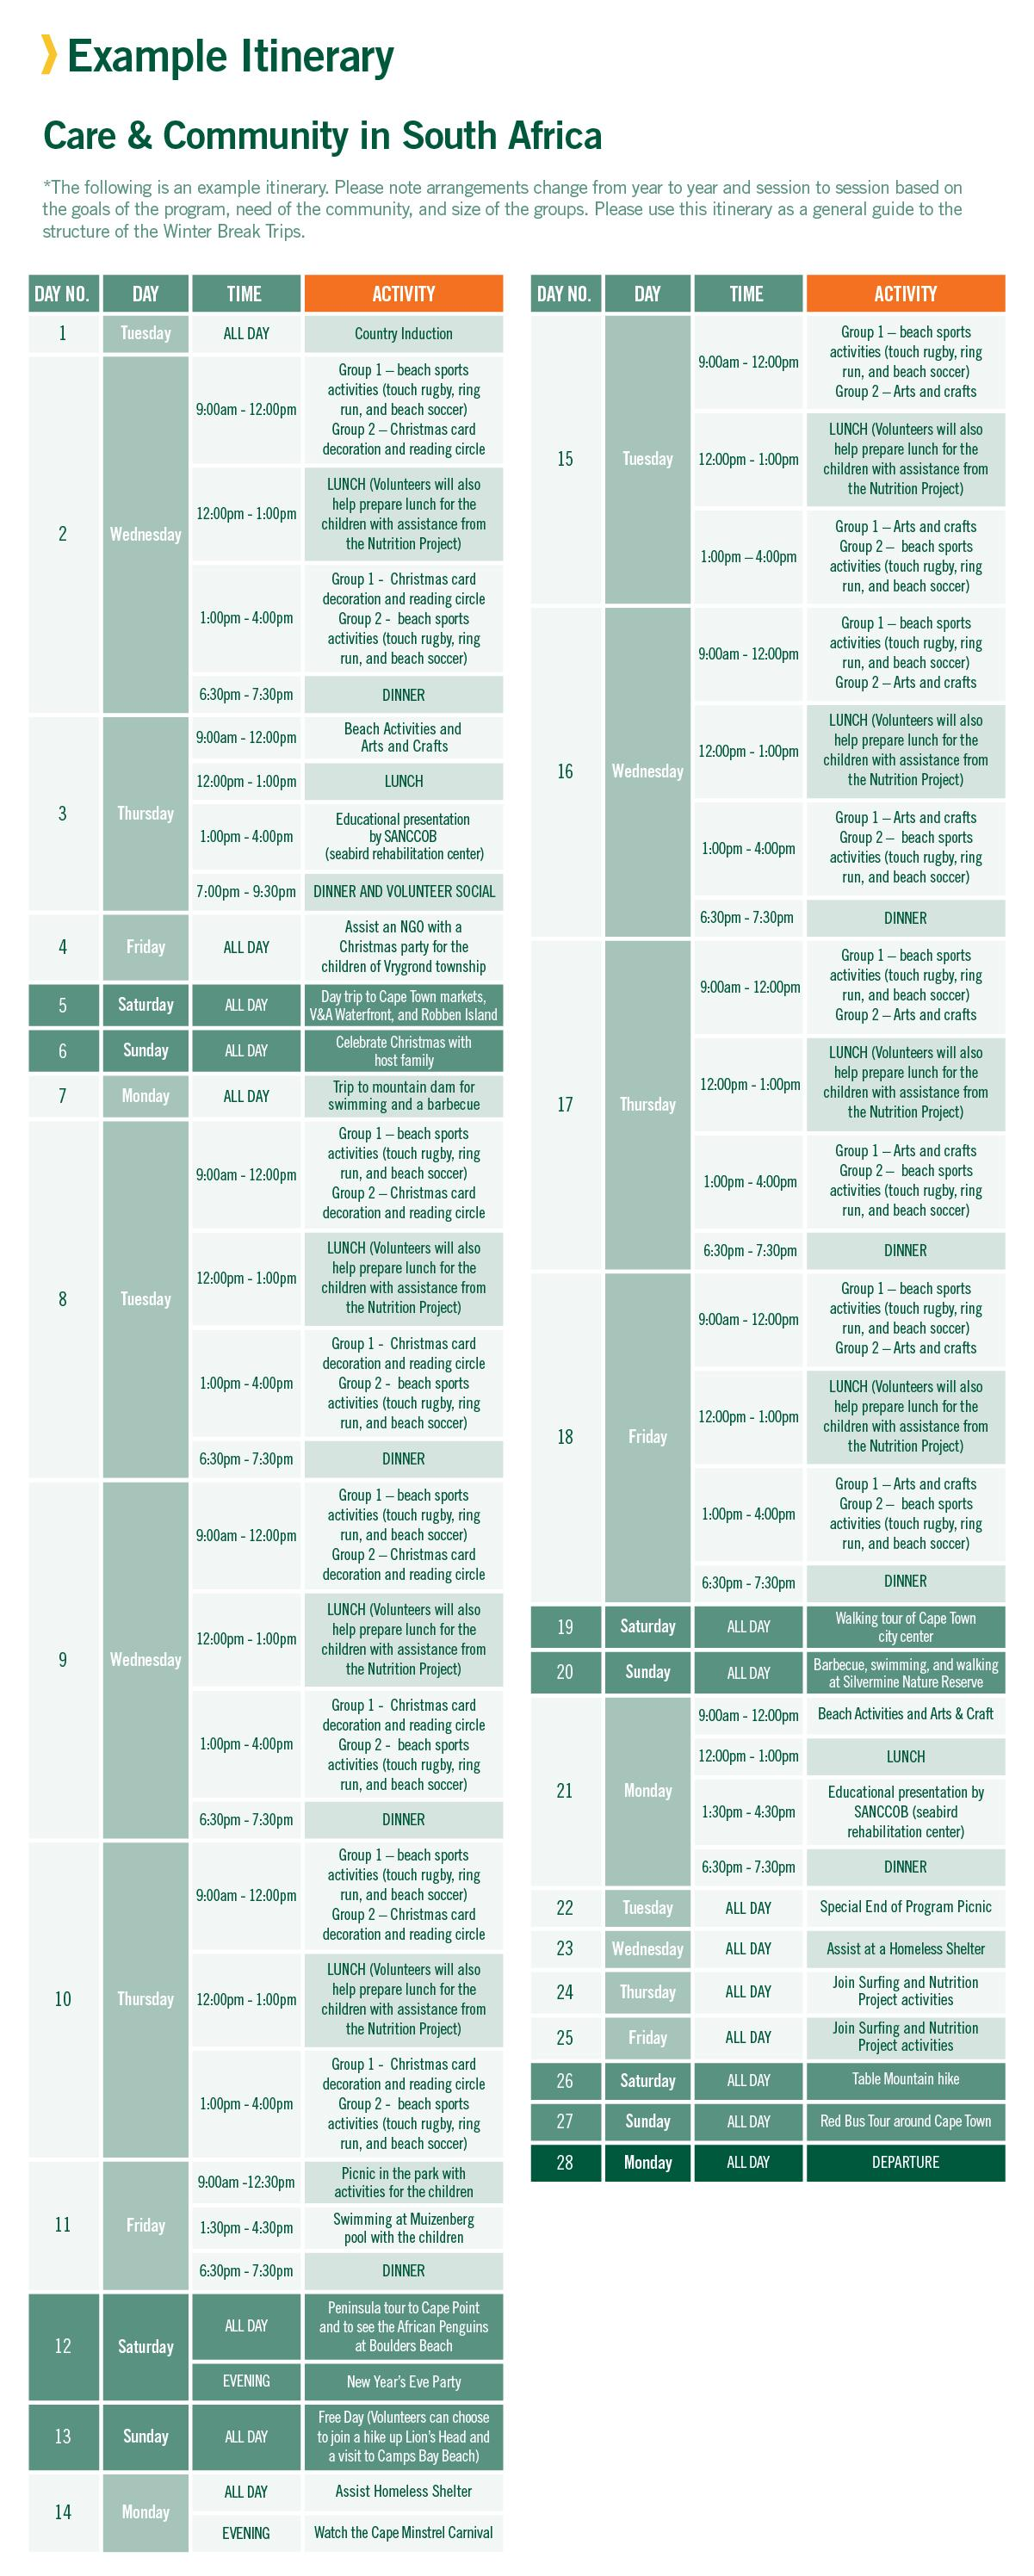 Winter Break Trip sample schedule for Care in South Africa 4 Weeks